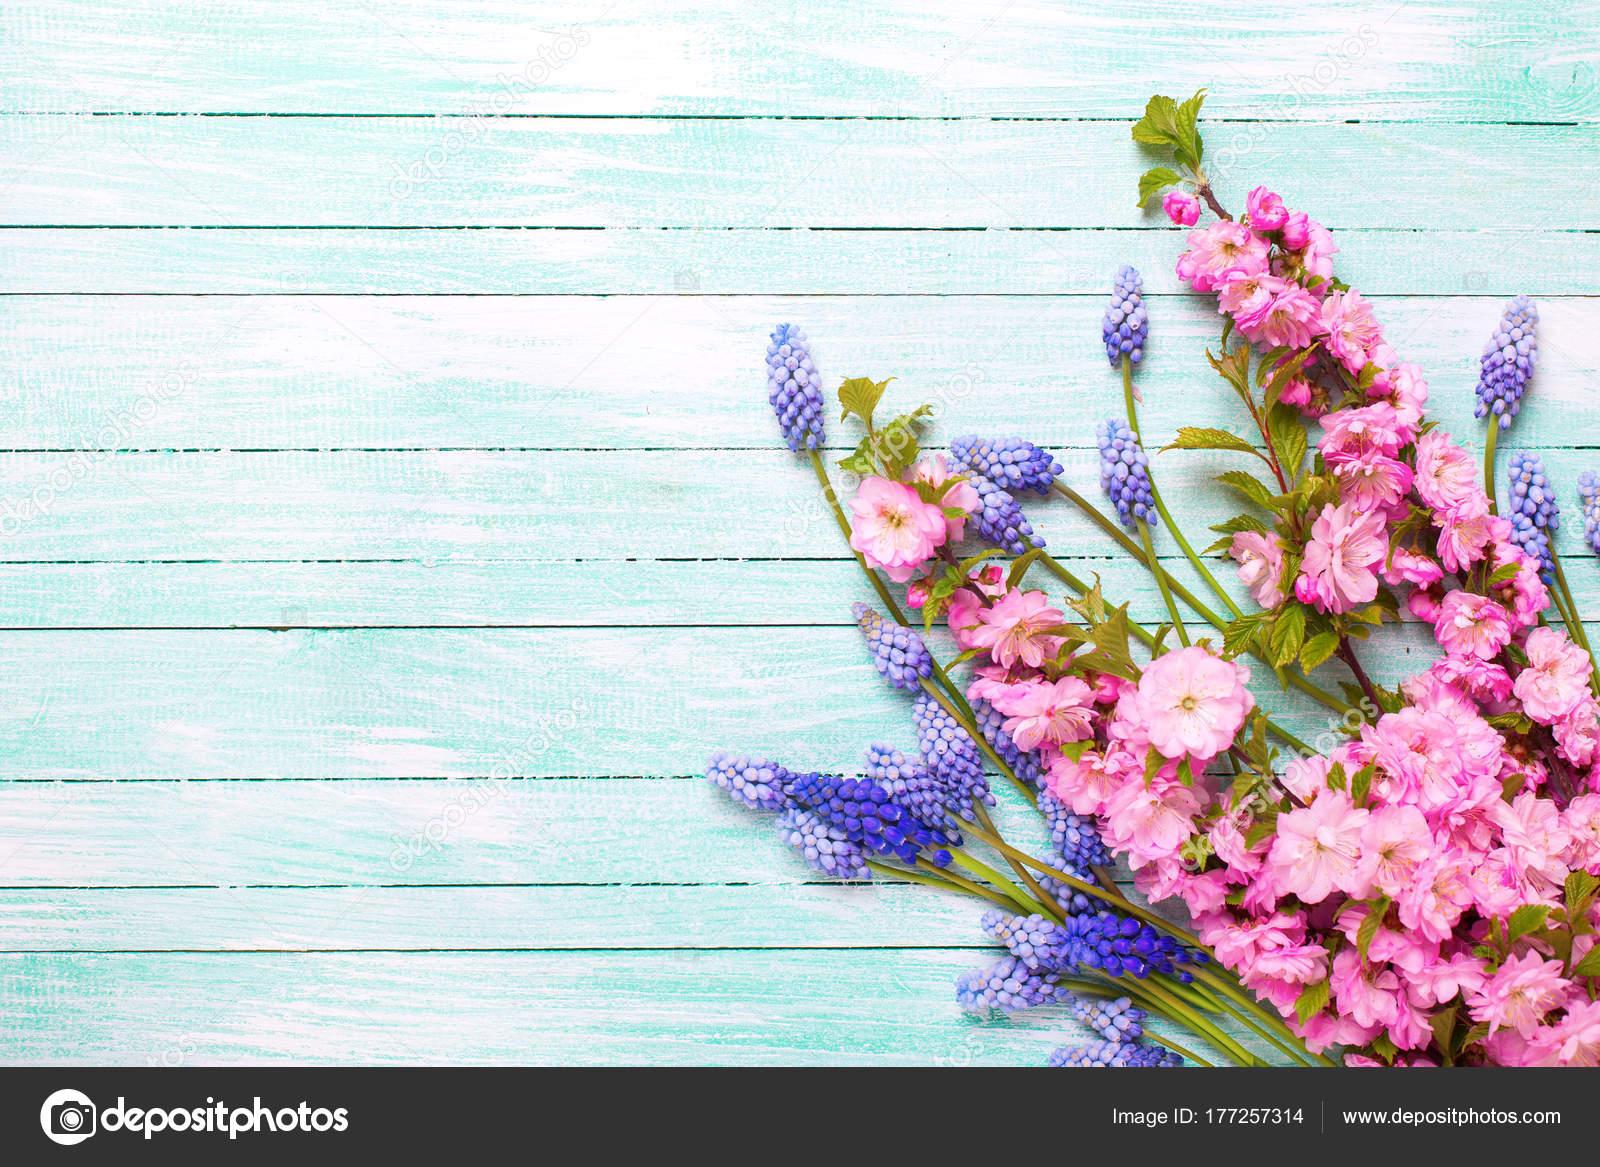 Background spring flowers pink almond blue muscaries flowers background spring flowers pink almond blue muscaries flowers turquoise wooden stock photo mightylinksfo Choice Image